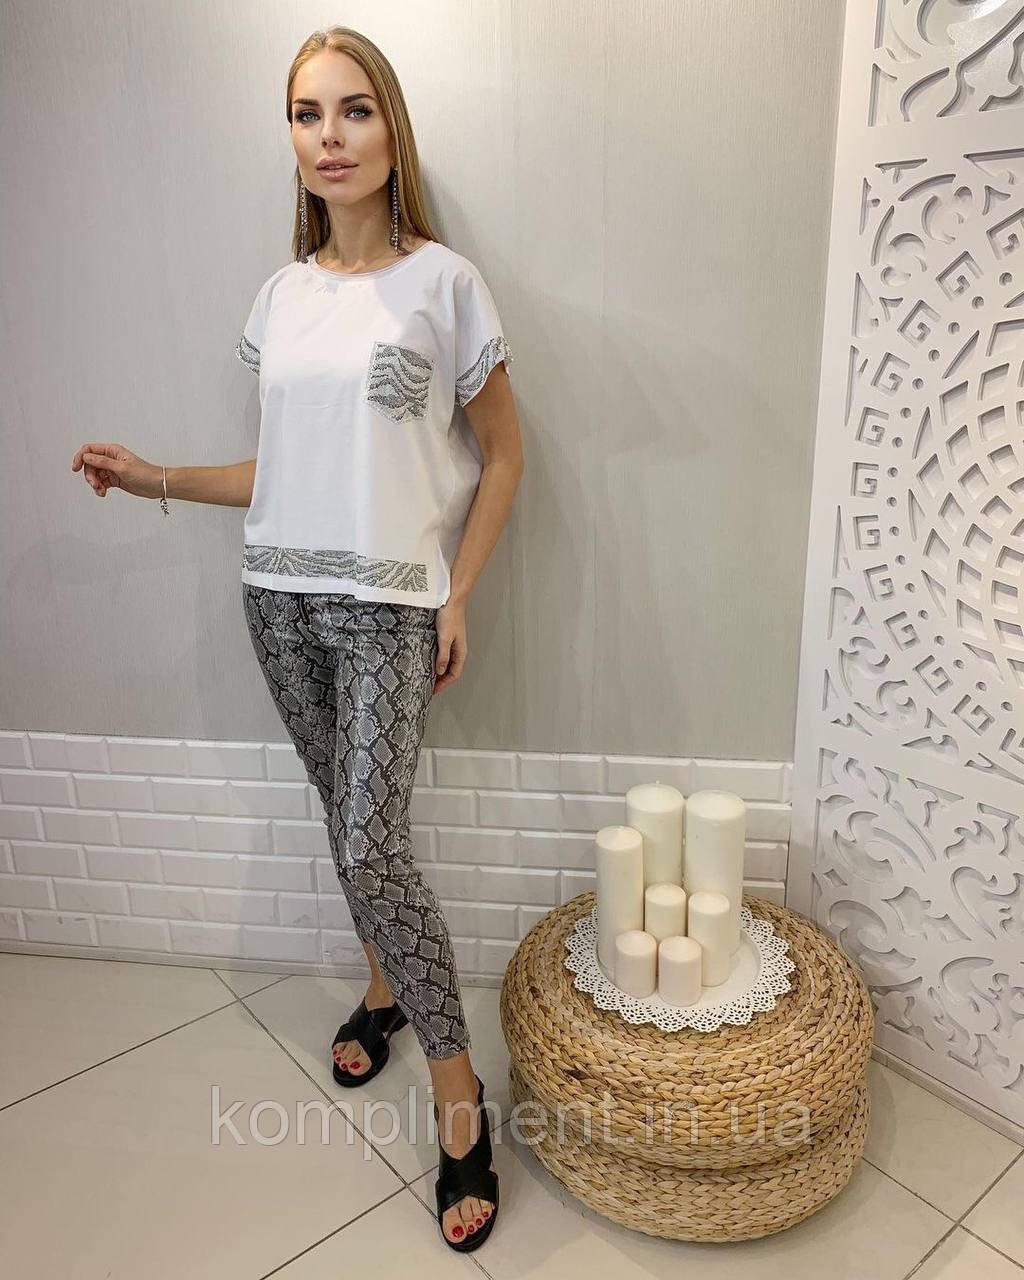 Женская турецкая трикотажная летняя футболка украшенная камнями , белая